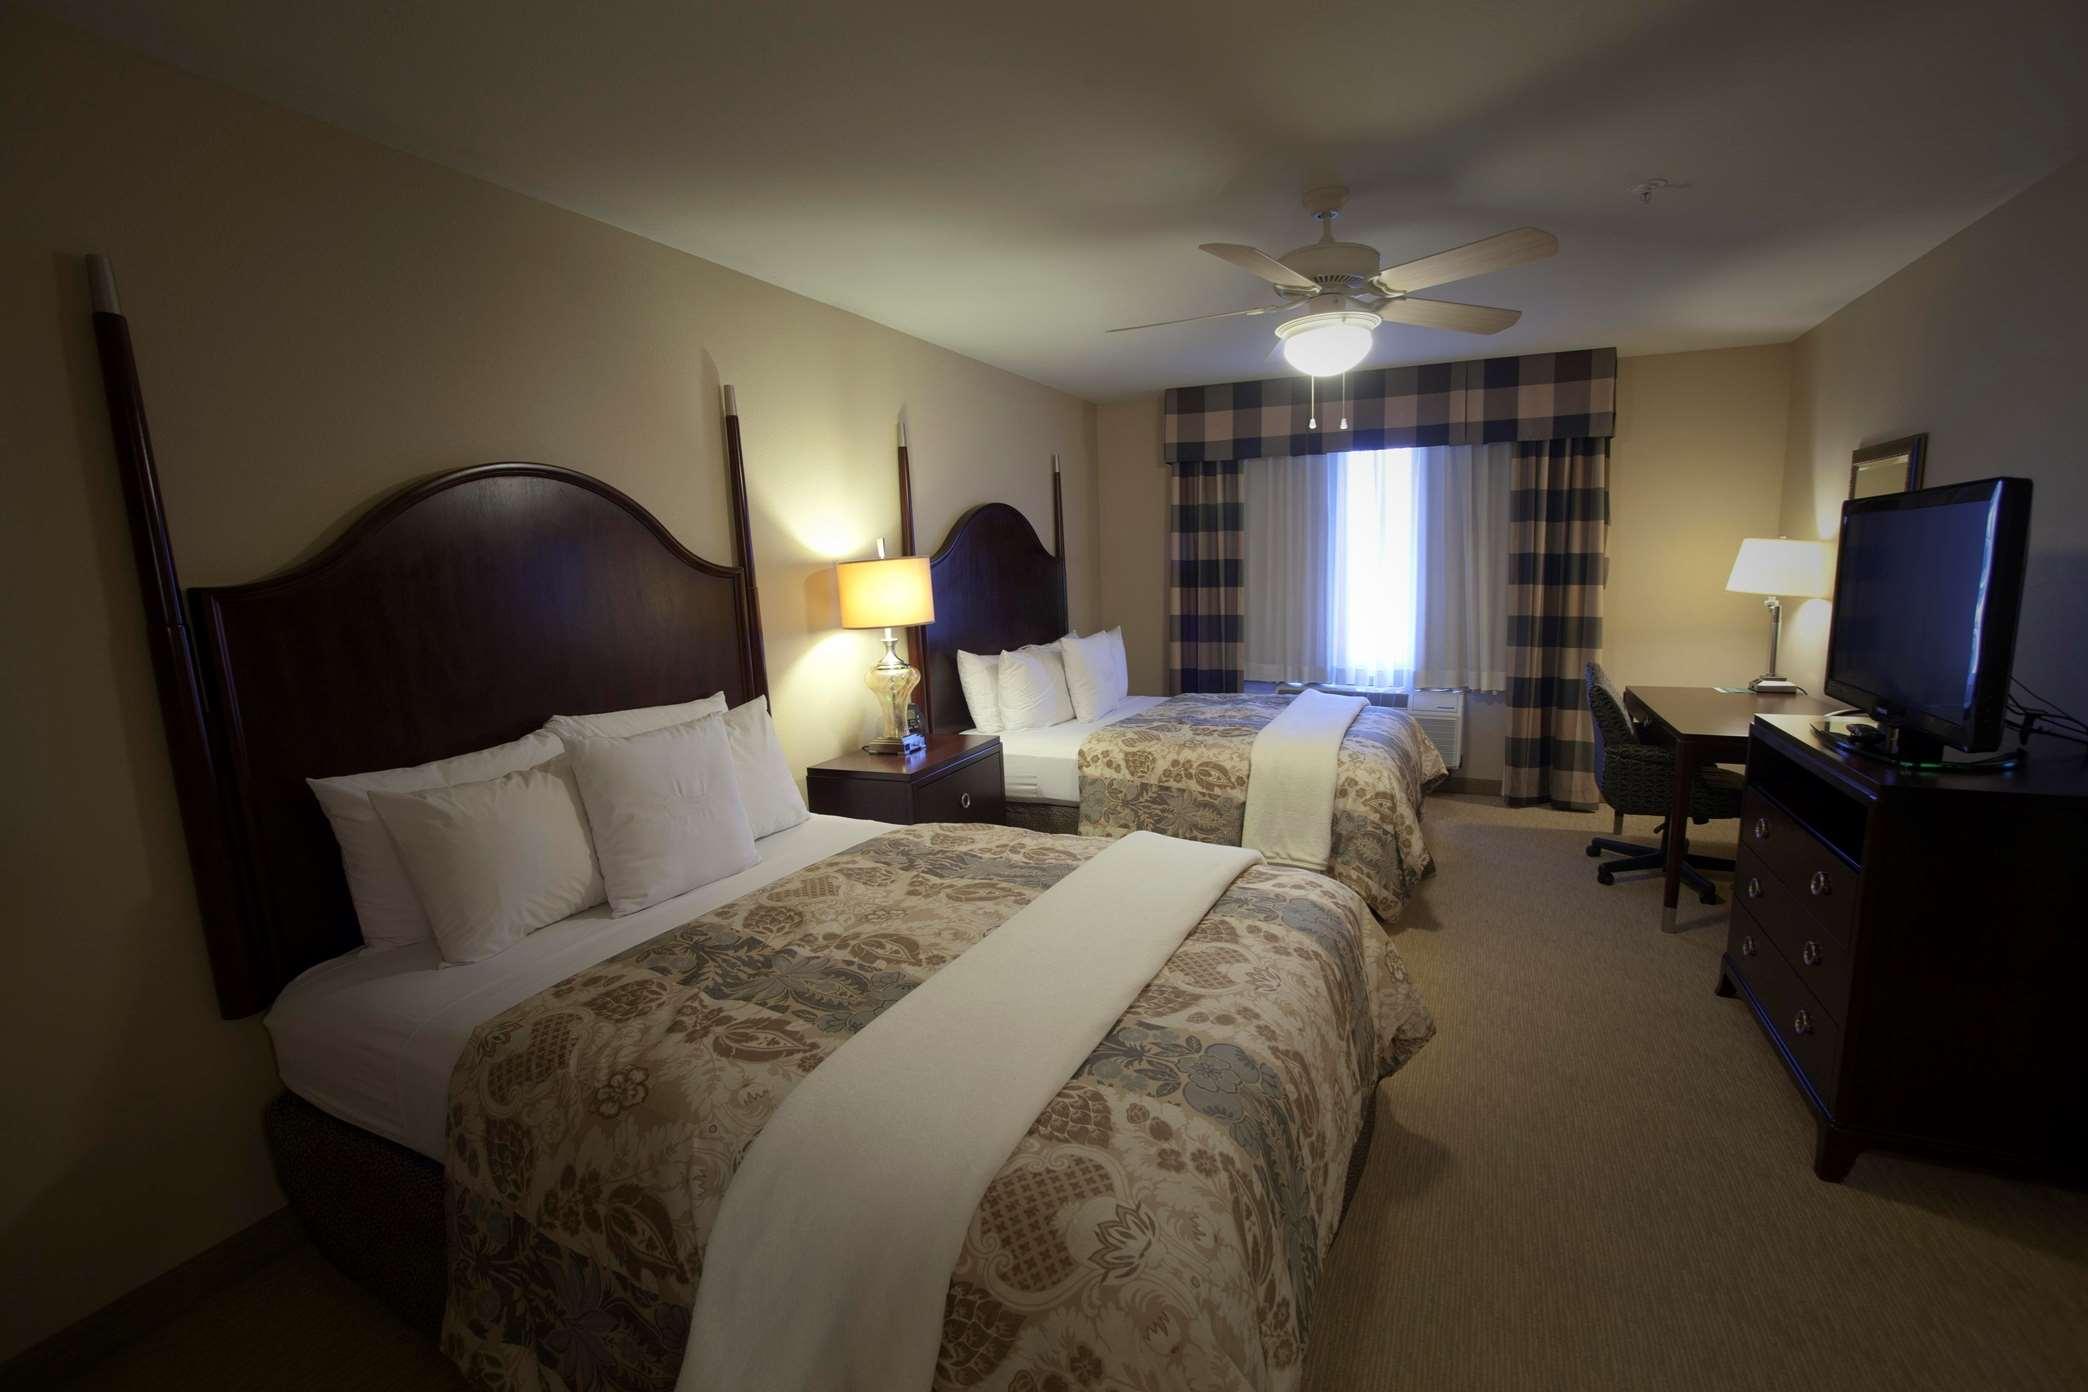 Homewood Suites by Hilton Albuquerque Airport image 2